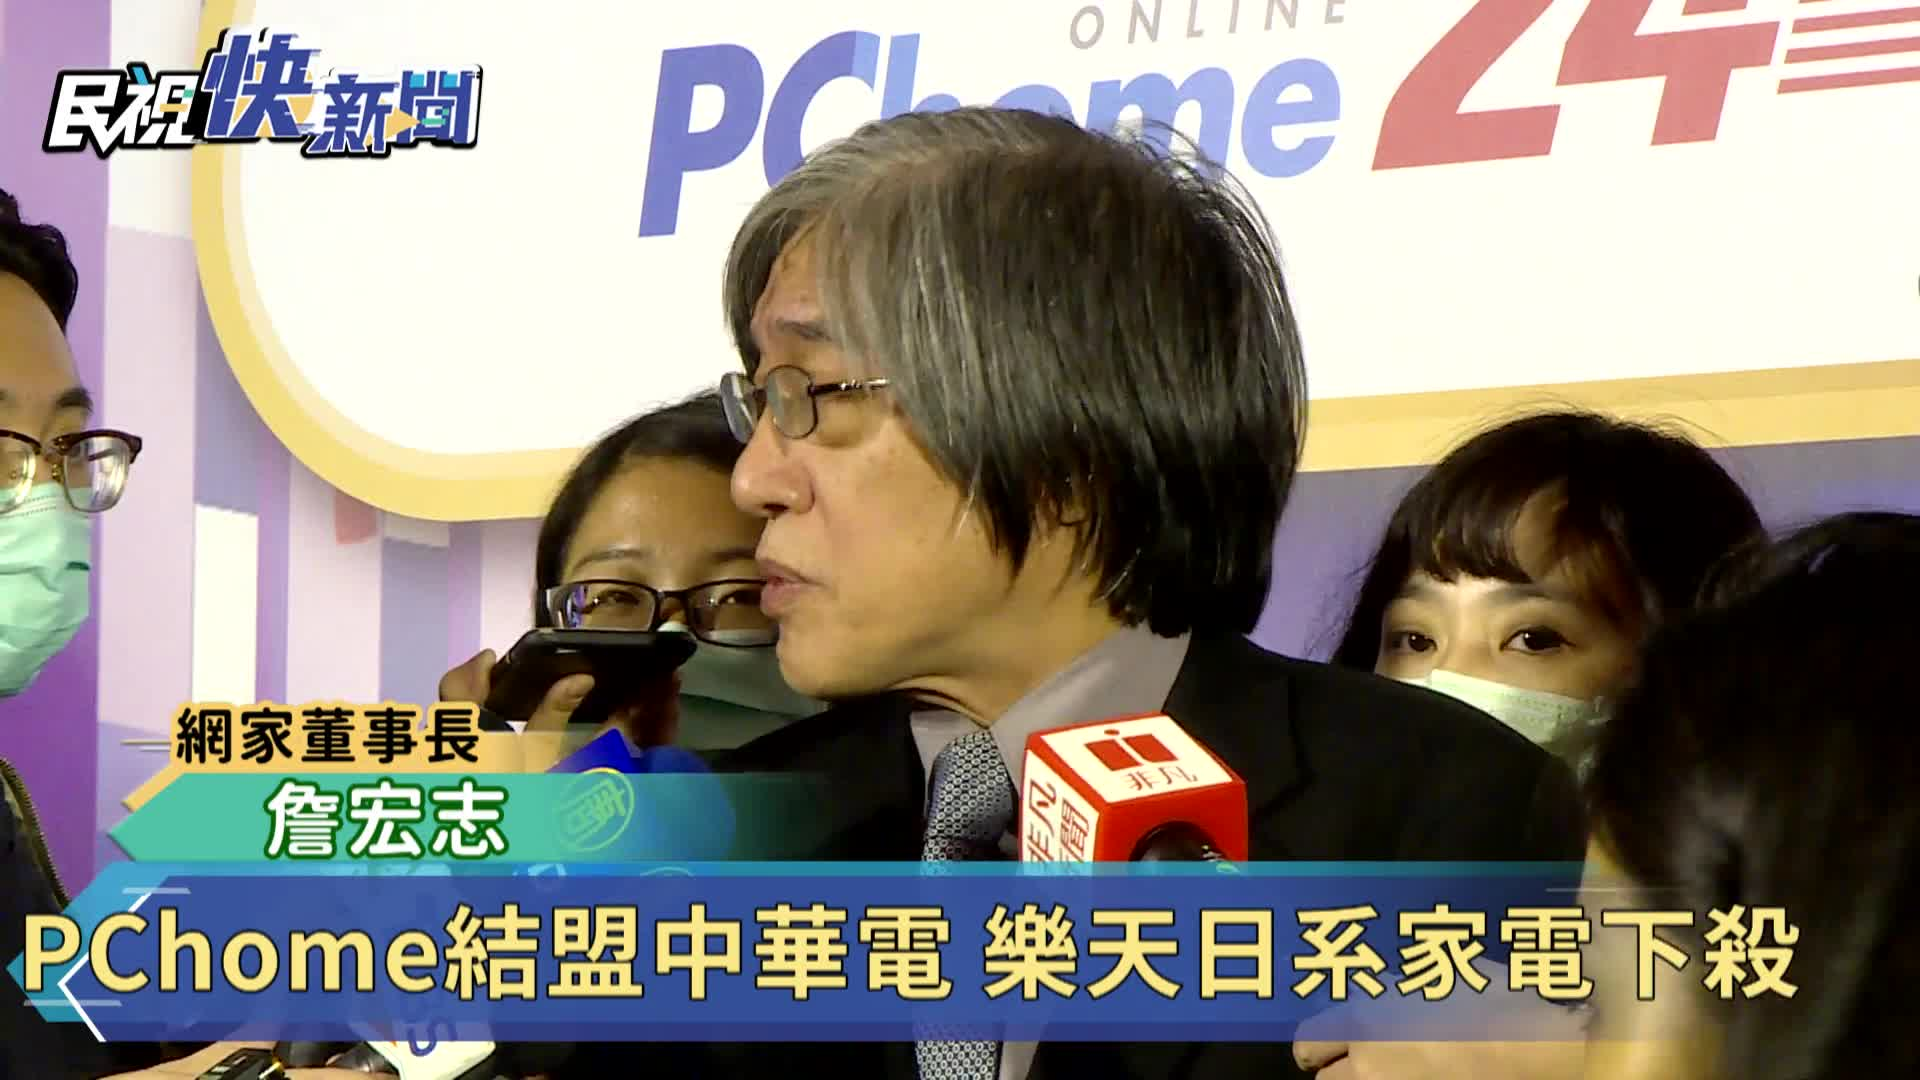 PChome結盟中華電 樂天市場日系家電下殺